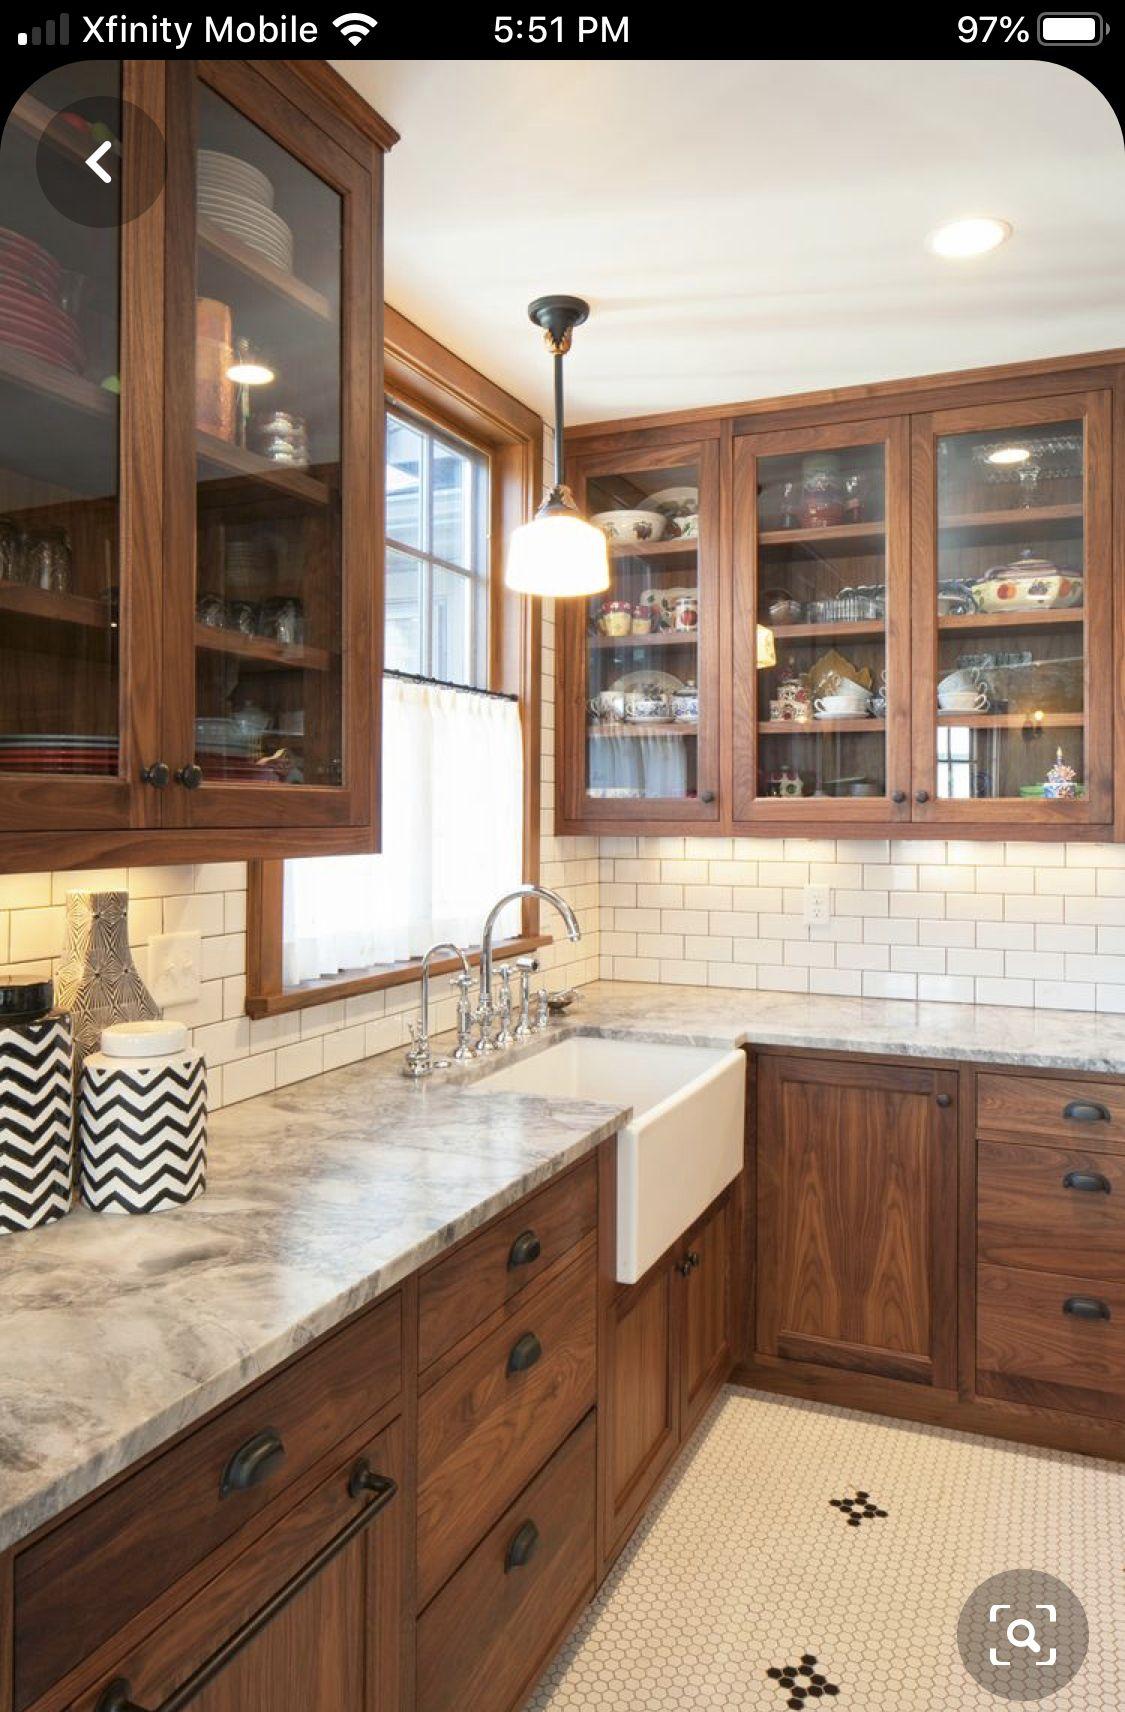 Pin By Janeti Alves Da Costa On Kitchen Cabinets Kitchen Cabinets And Countertops Kitchen Cabinet Design Kitchen Design